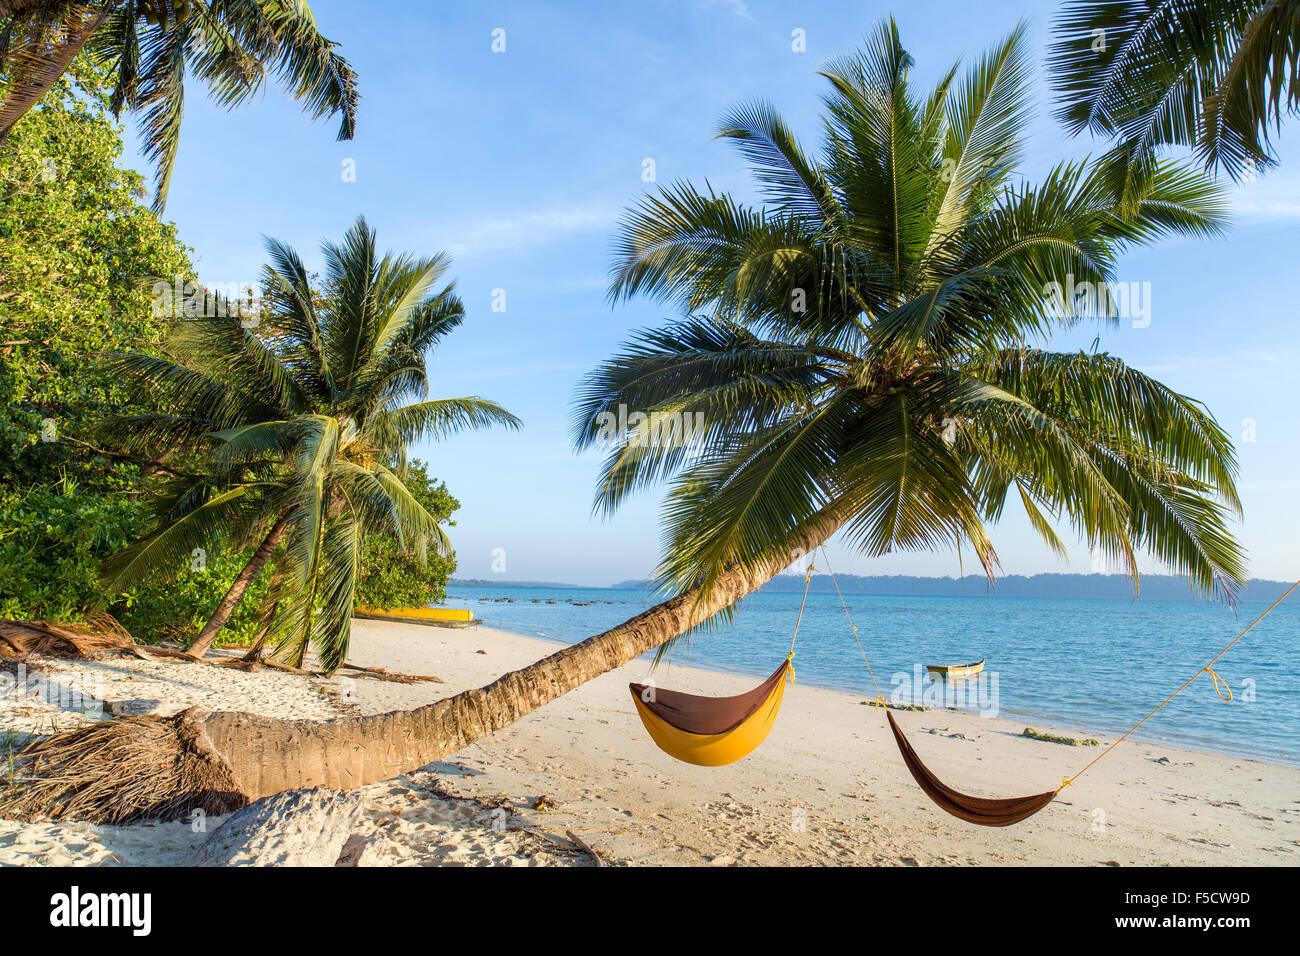 Palms and hammocks at a beautiful beach on Havlock islands - Stock Image